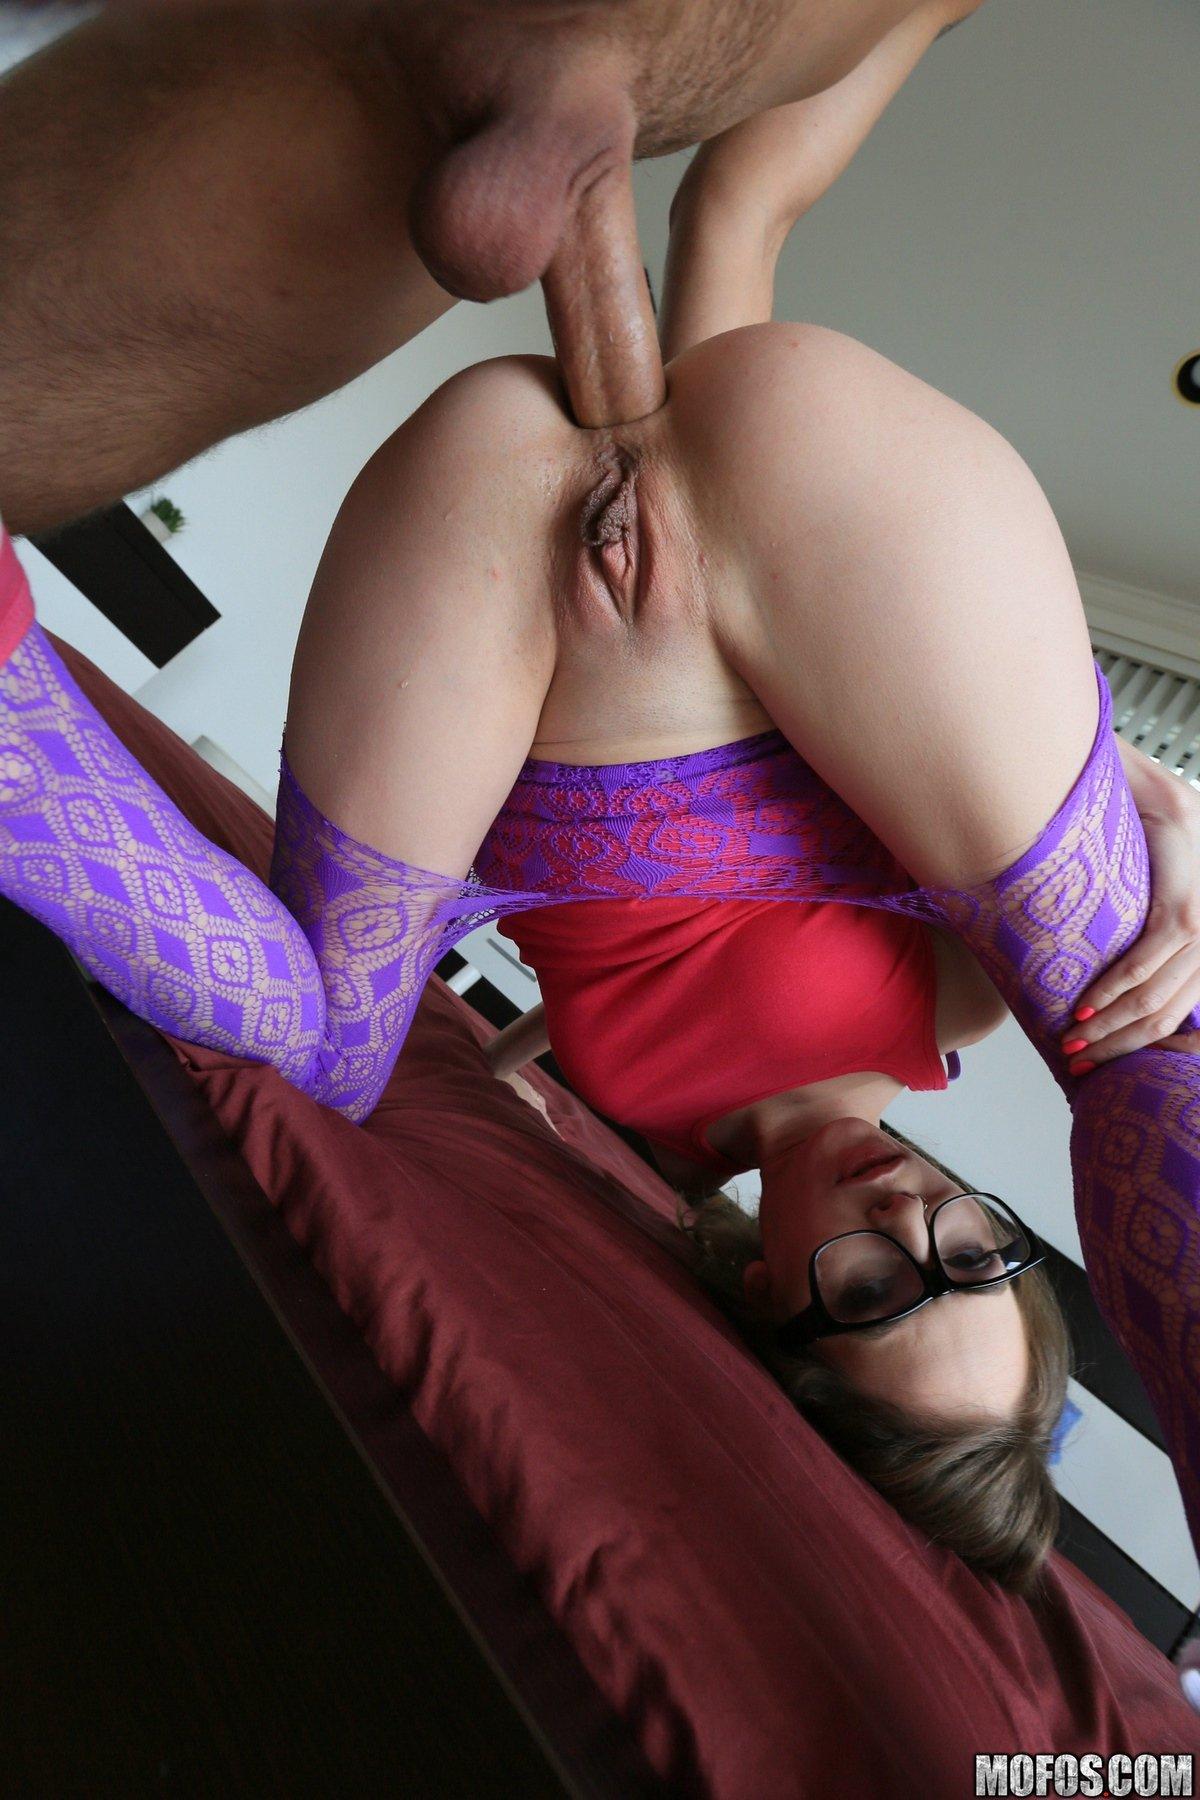 Разорвал колготки и трахнул чувиху в сраку секс фото